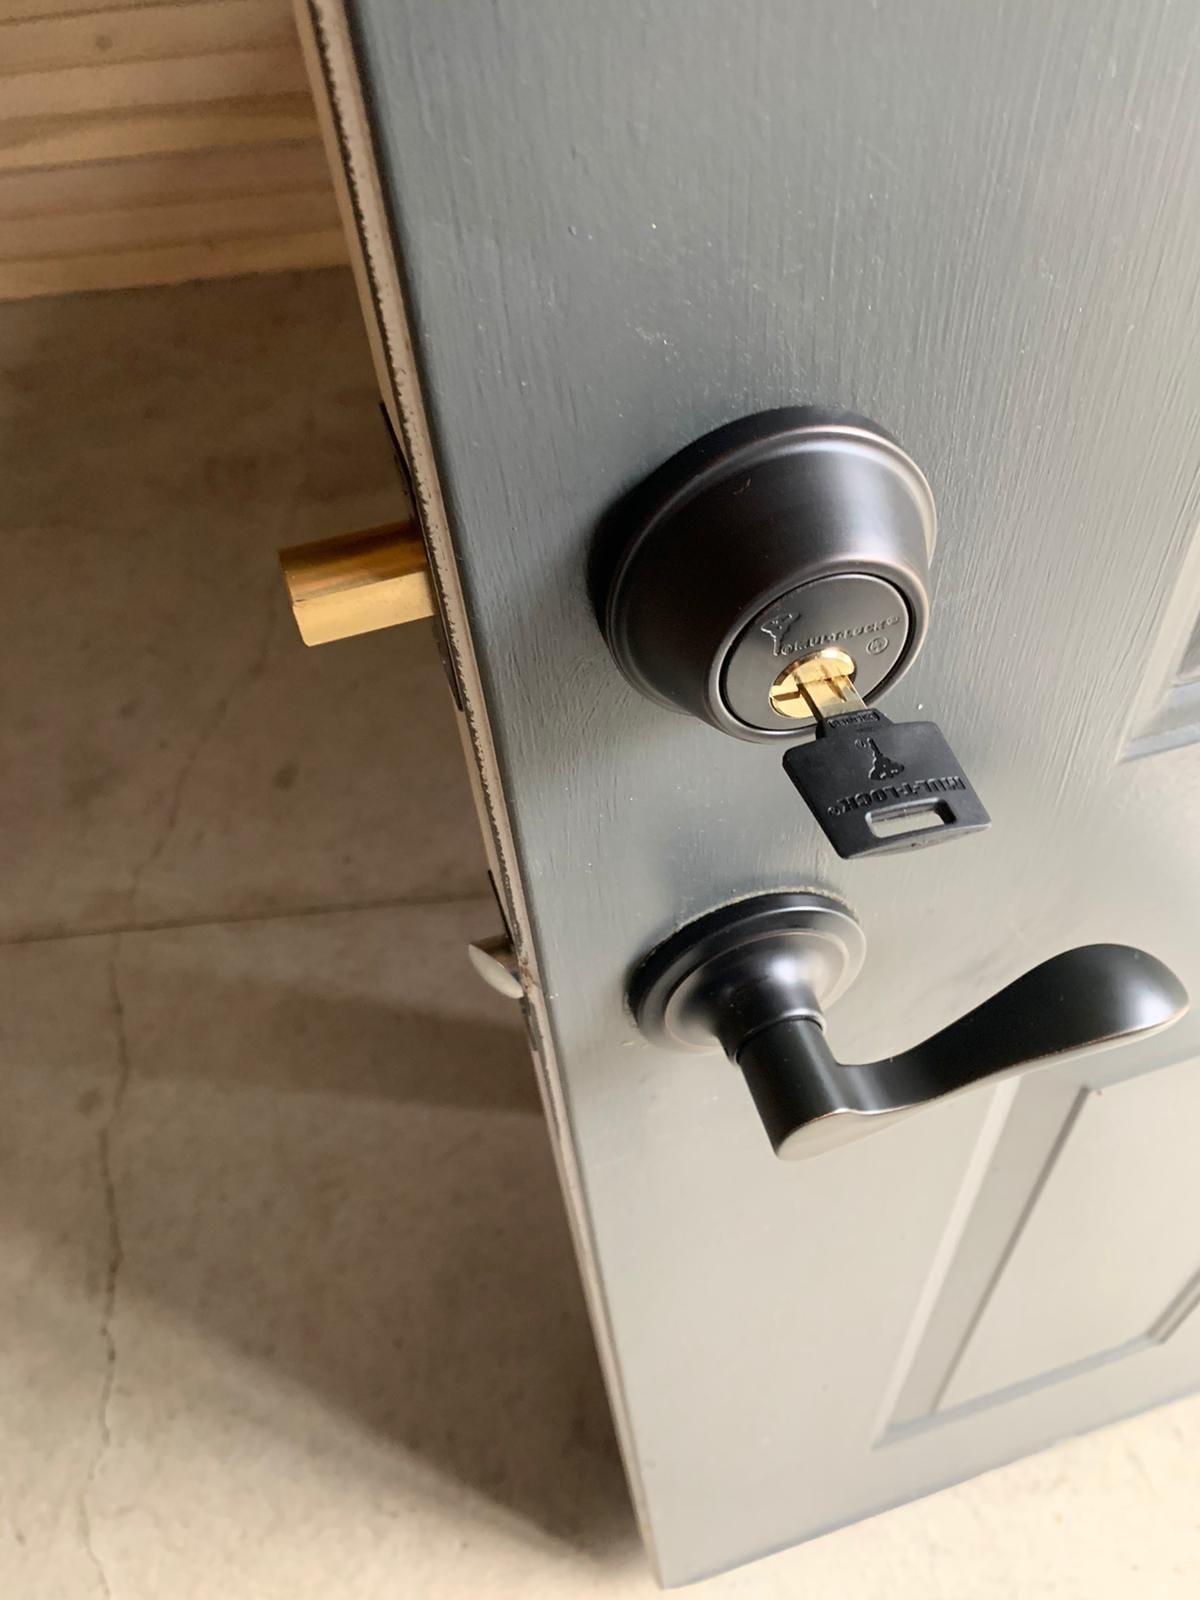 Keyed entry residential lock -lock picking shouldnt harm the locks